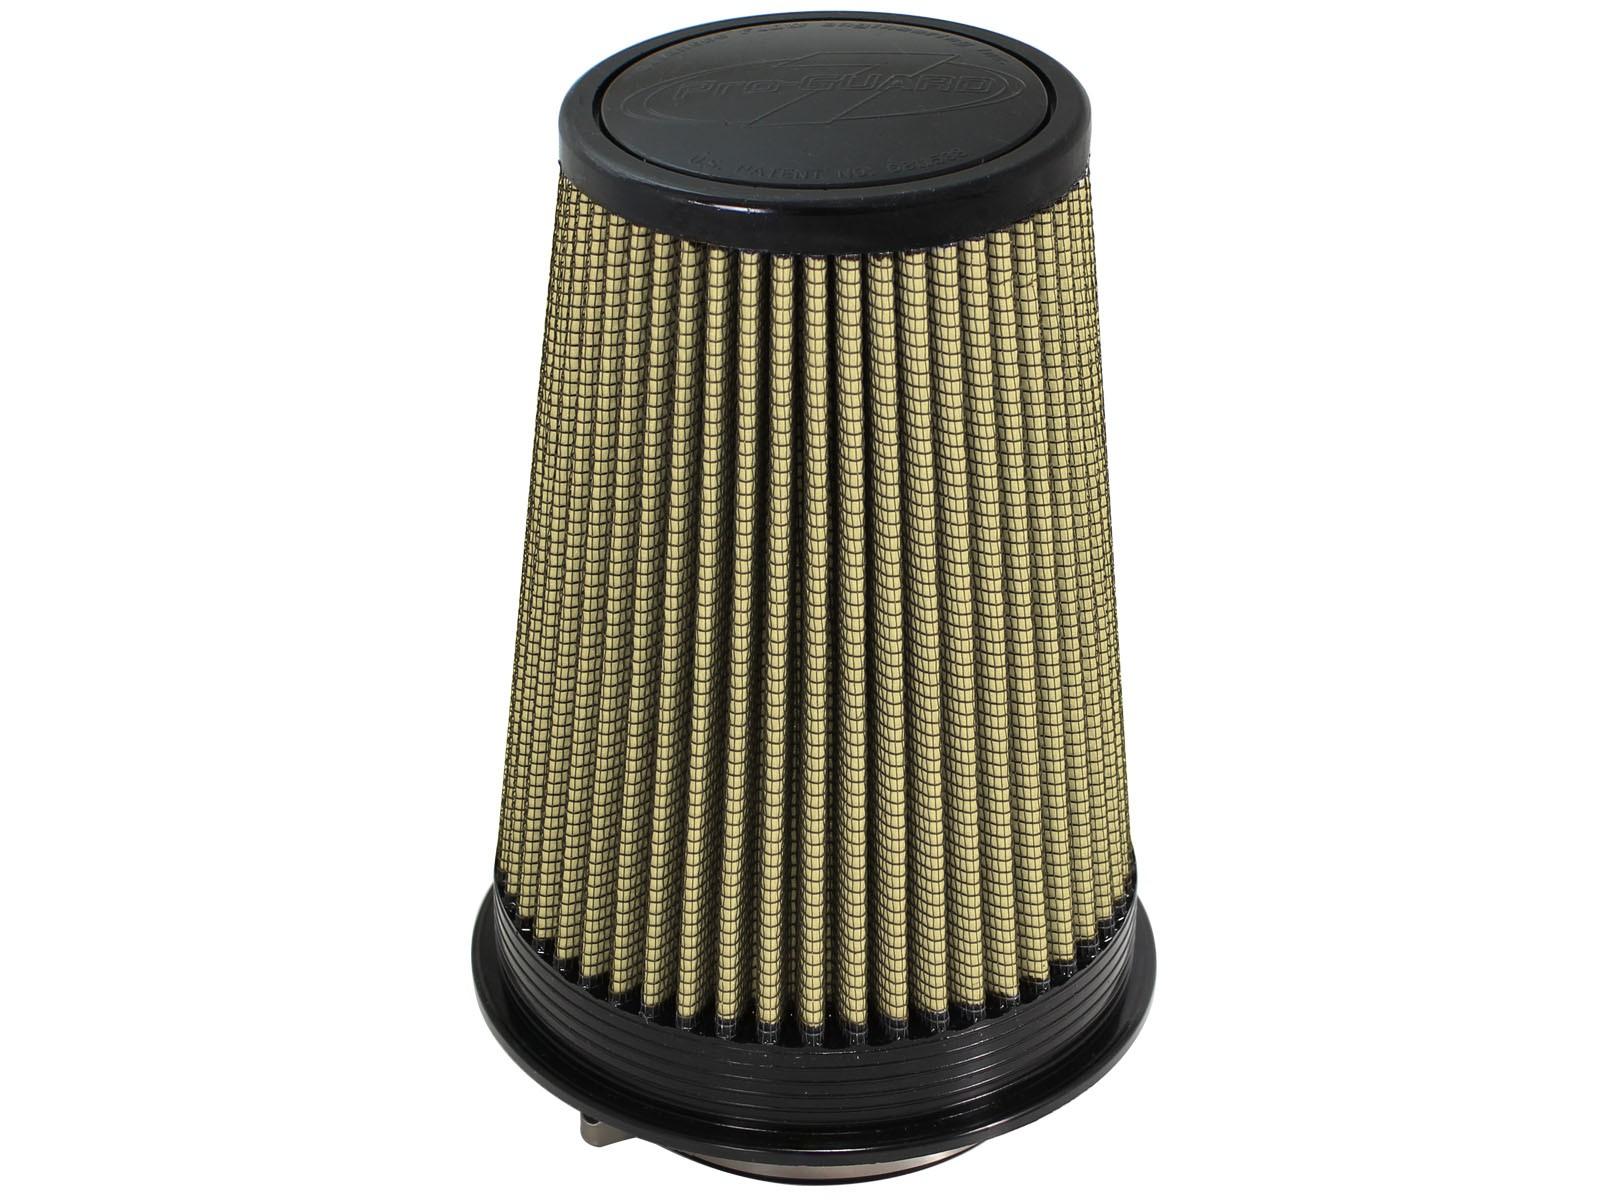 aFe POWER 72-90084 Magnum FLOW Pro GUARD7 Air Filter